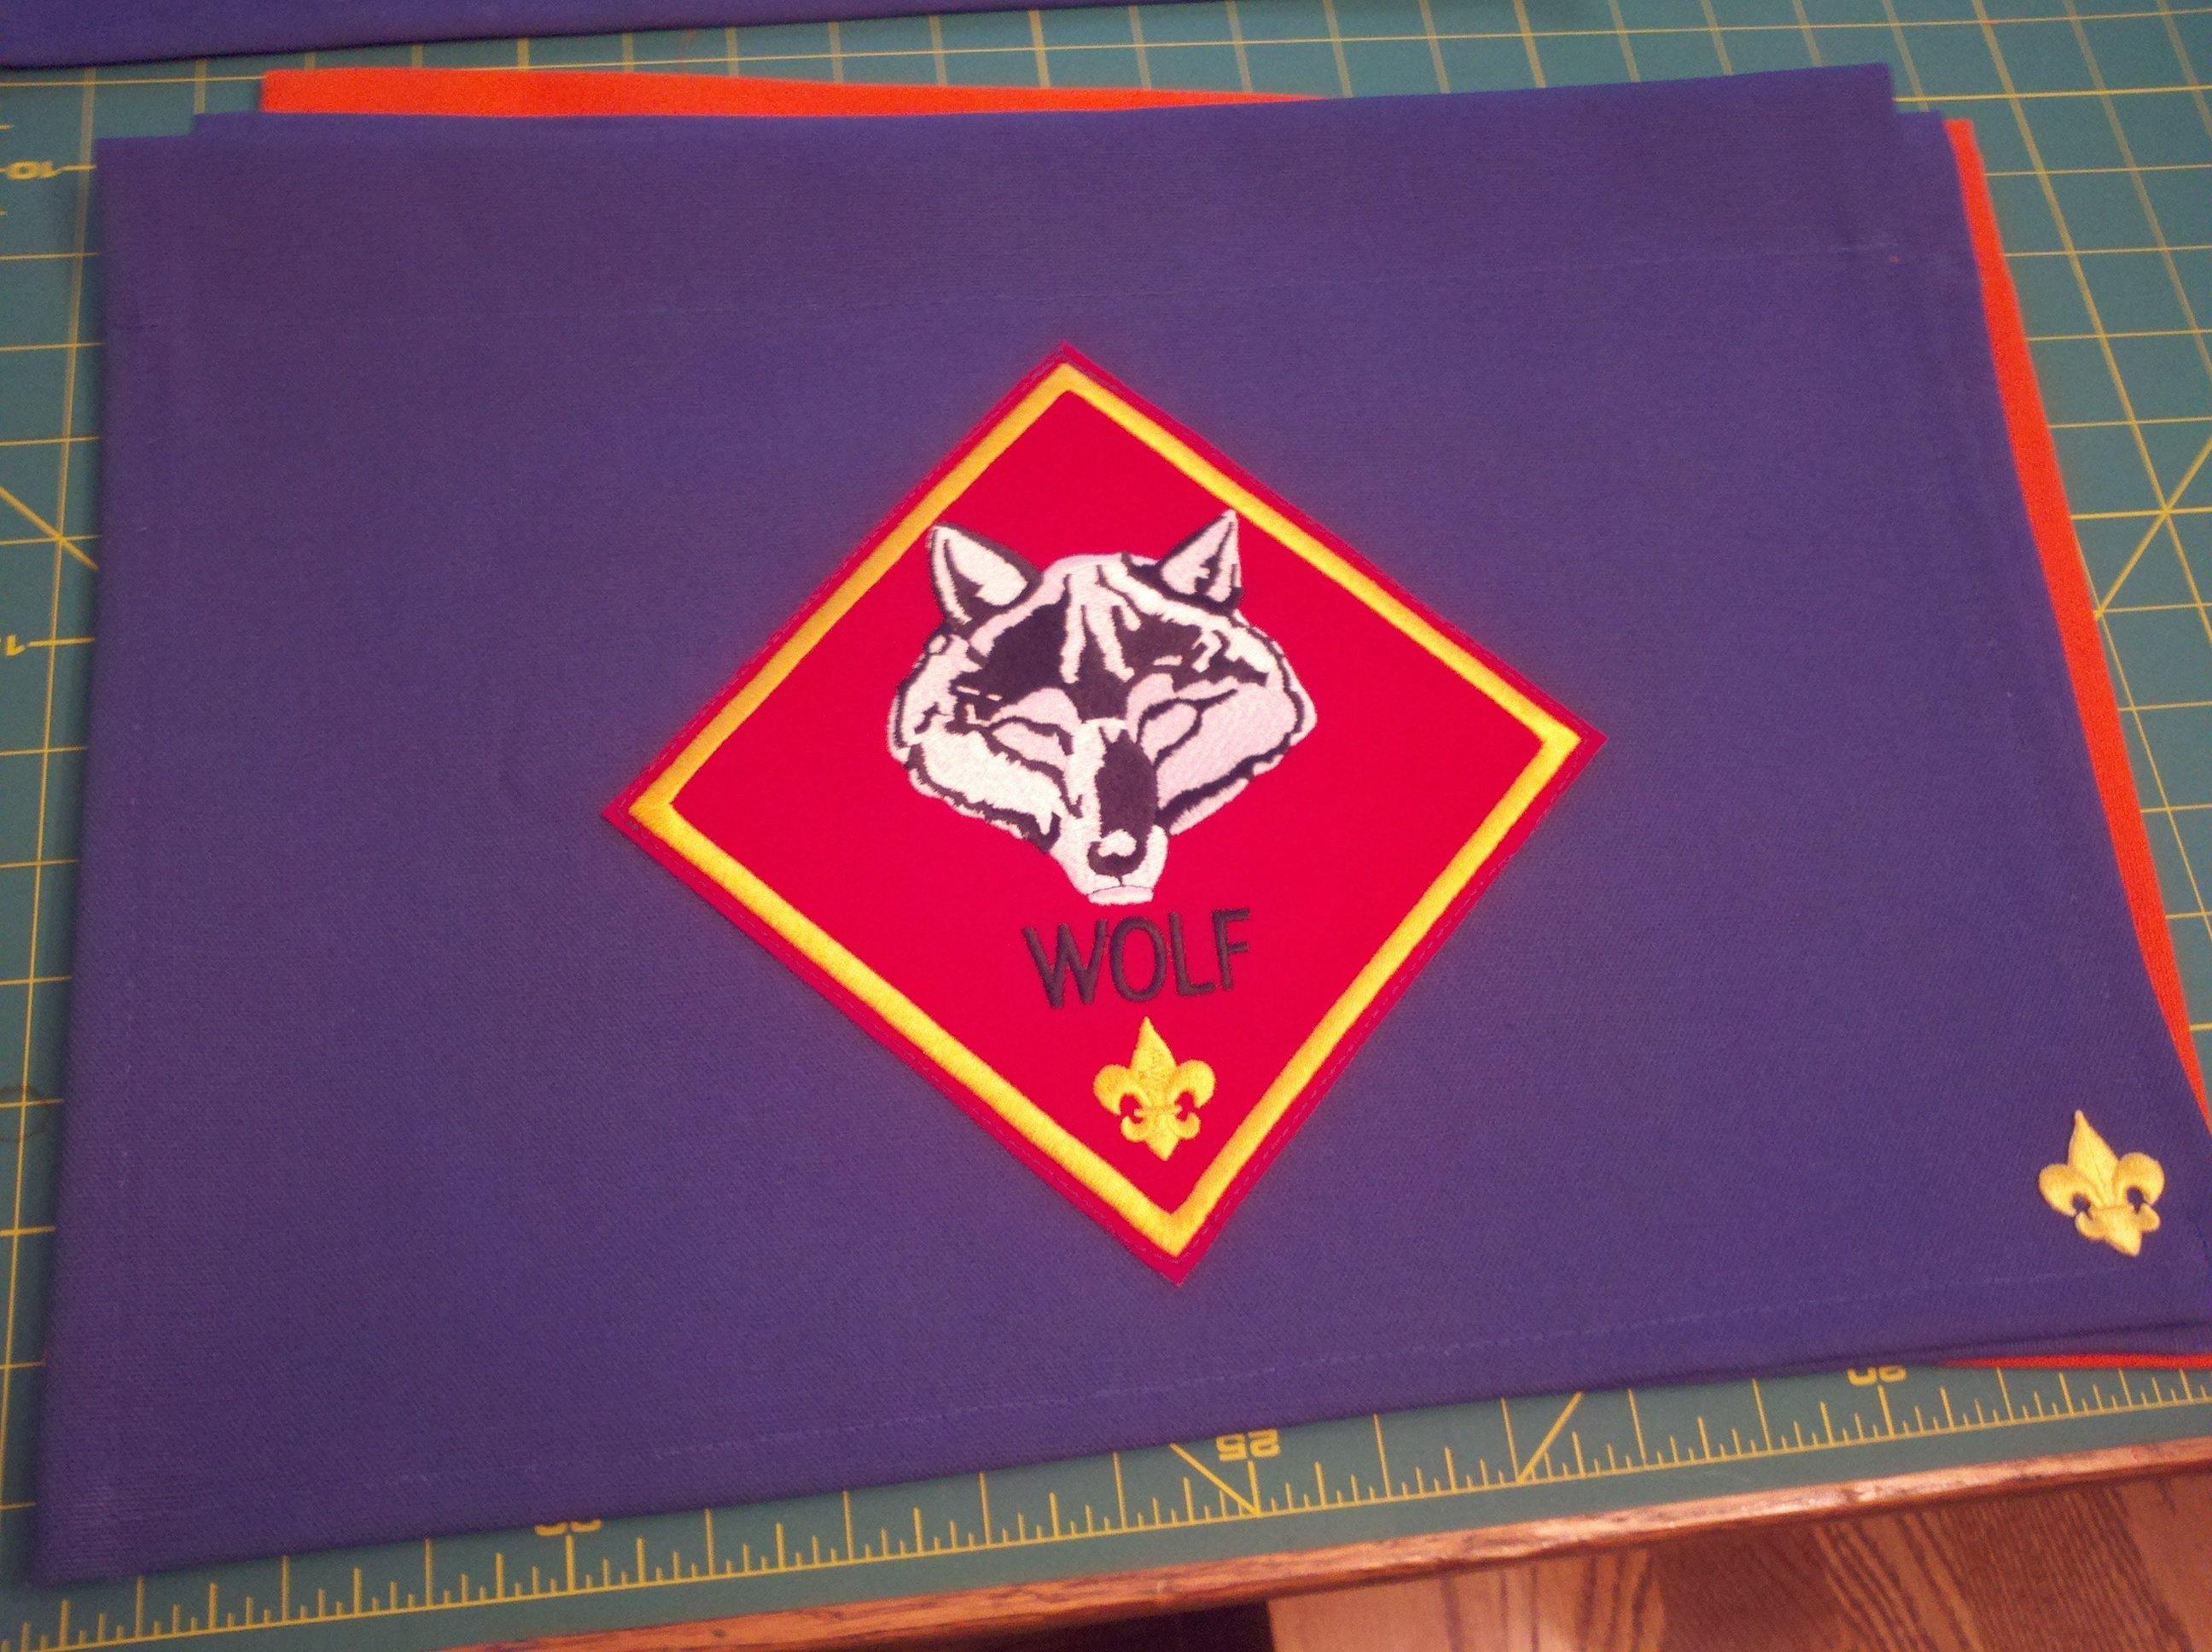 10 Pretty Cub Scout Den Flag Ideas wolf den flag cub scout den flags pinterest wolf den cub 2021